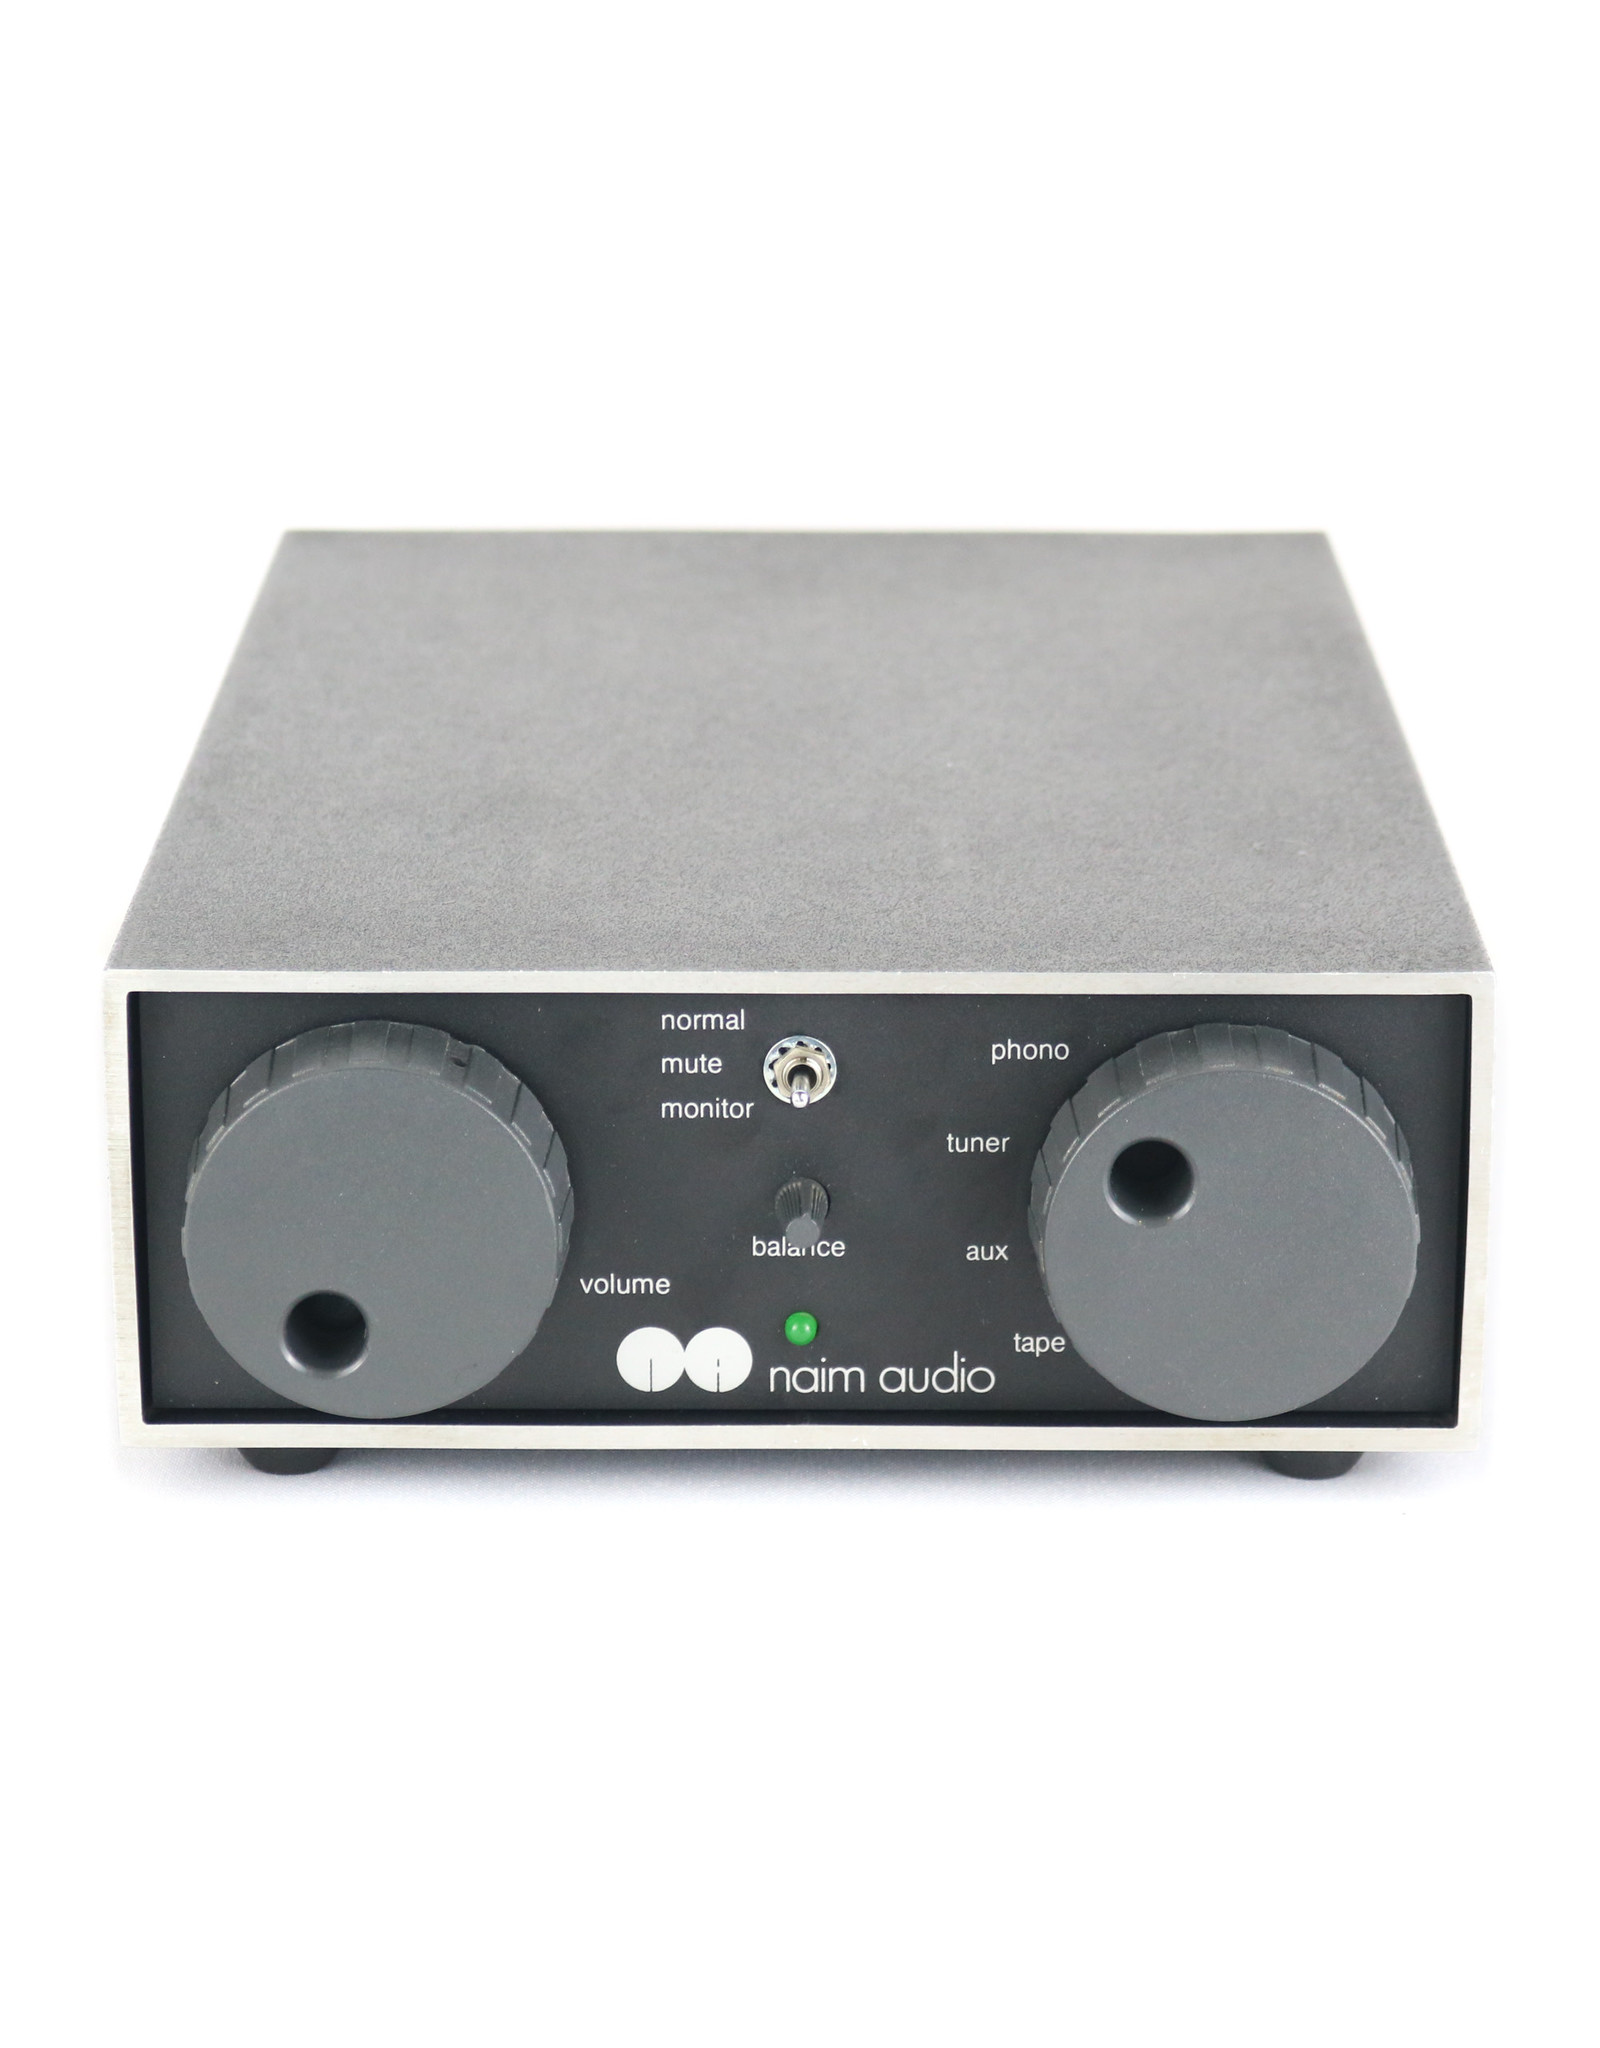 Naim Audio Naim Audio NAC 62 Preamp Chrome Bumper (Recapped 2021) USED